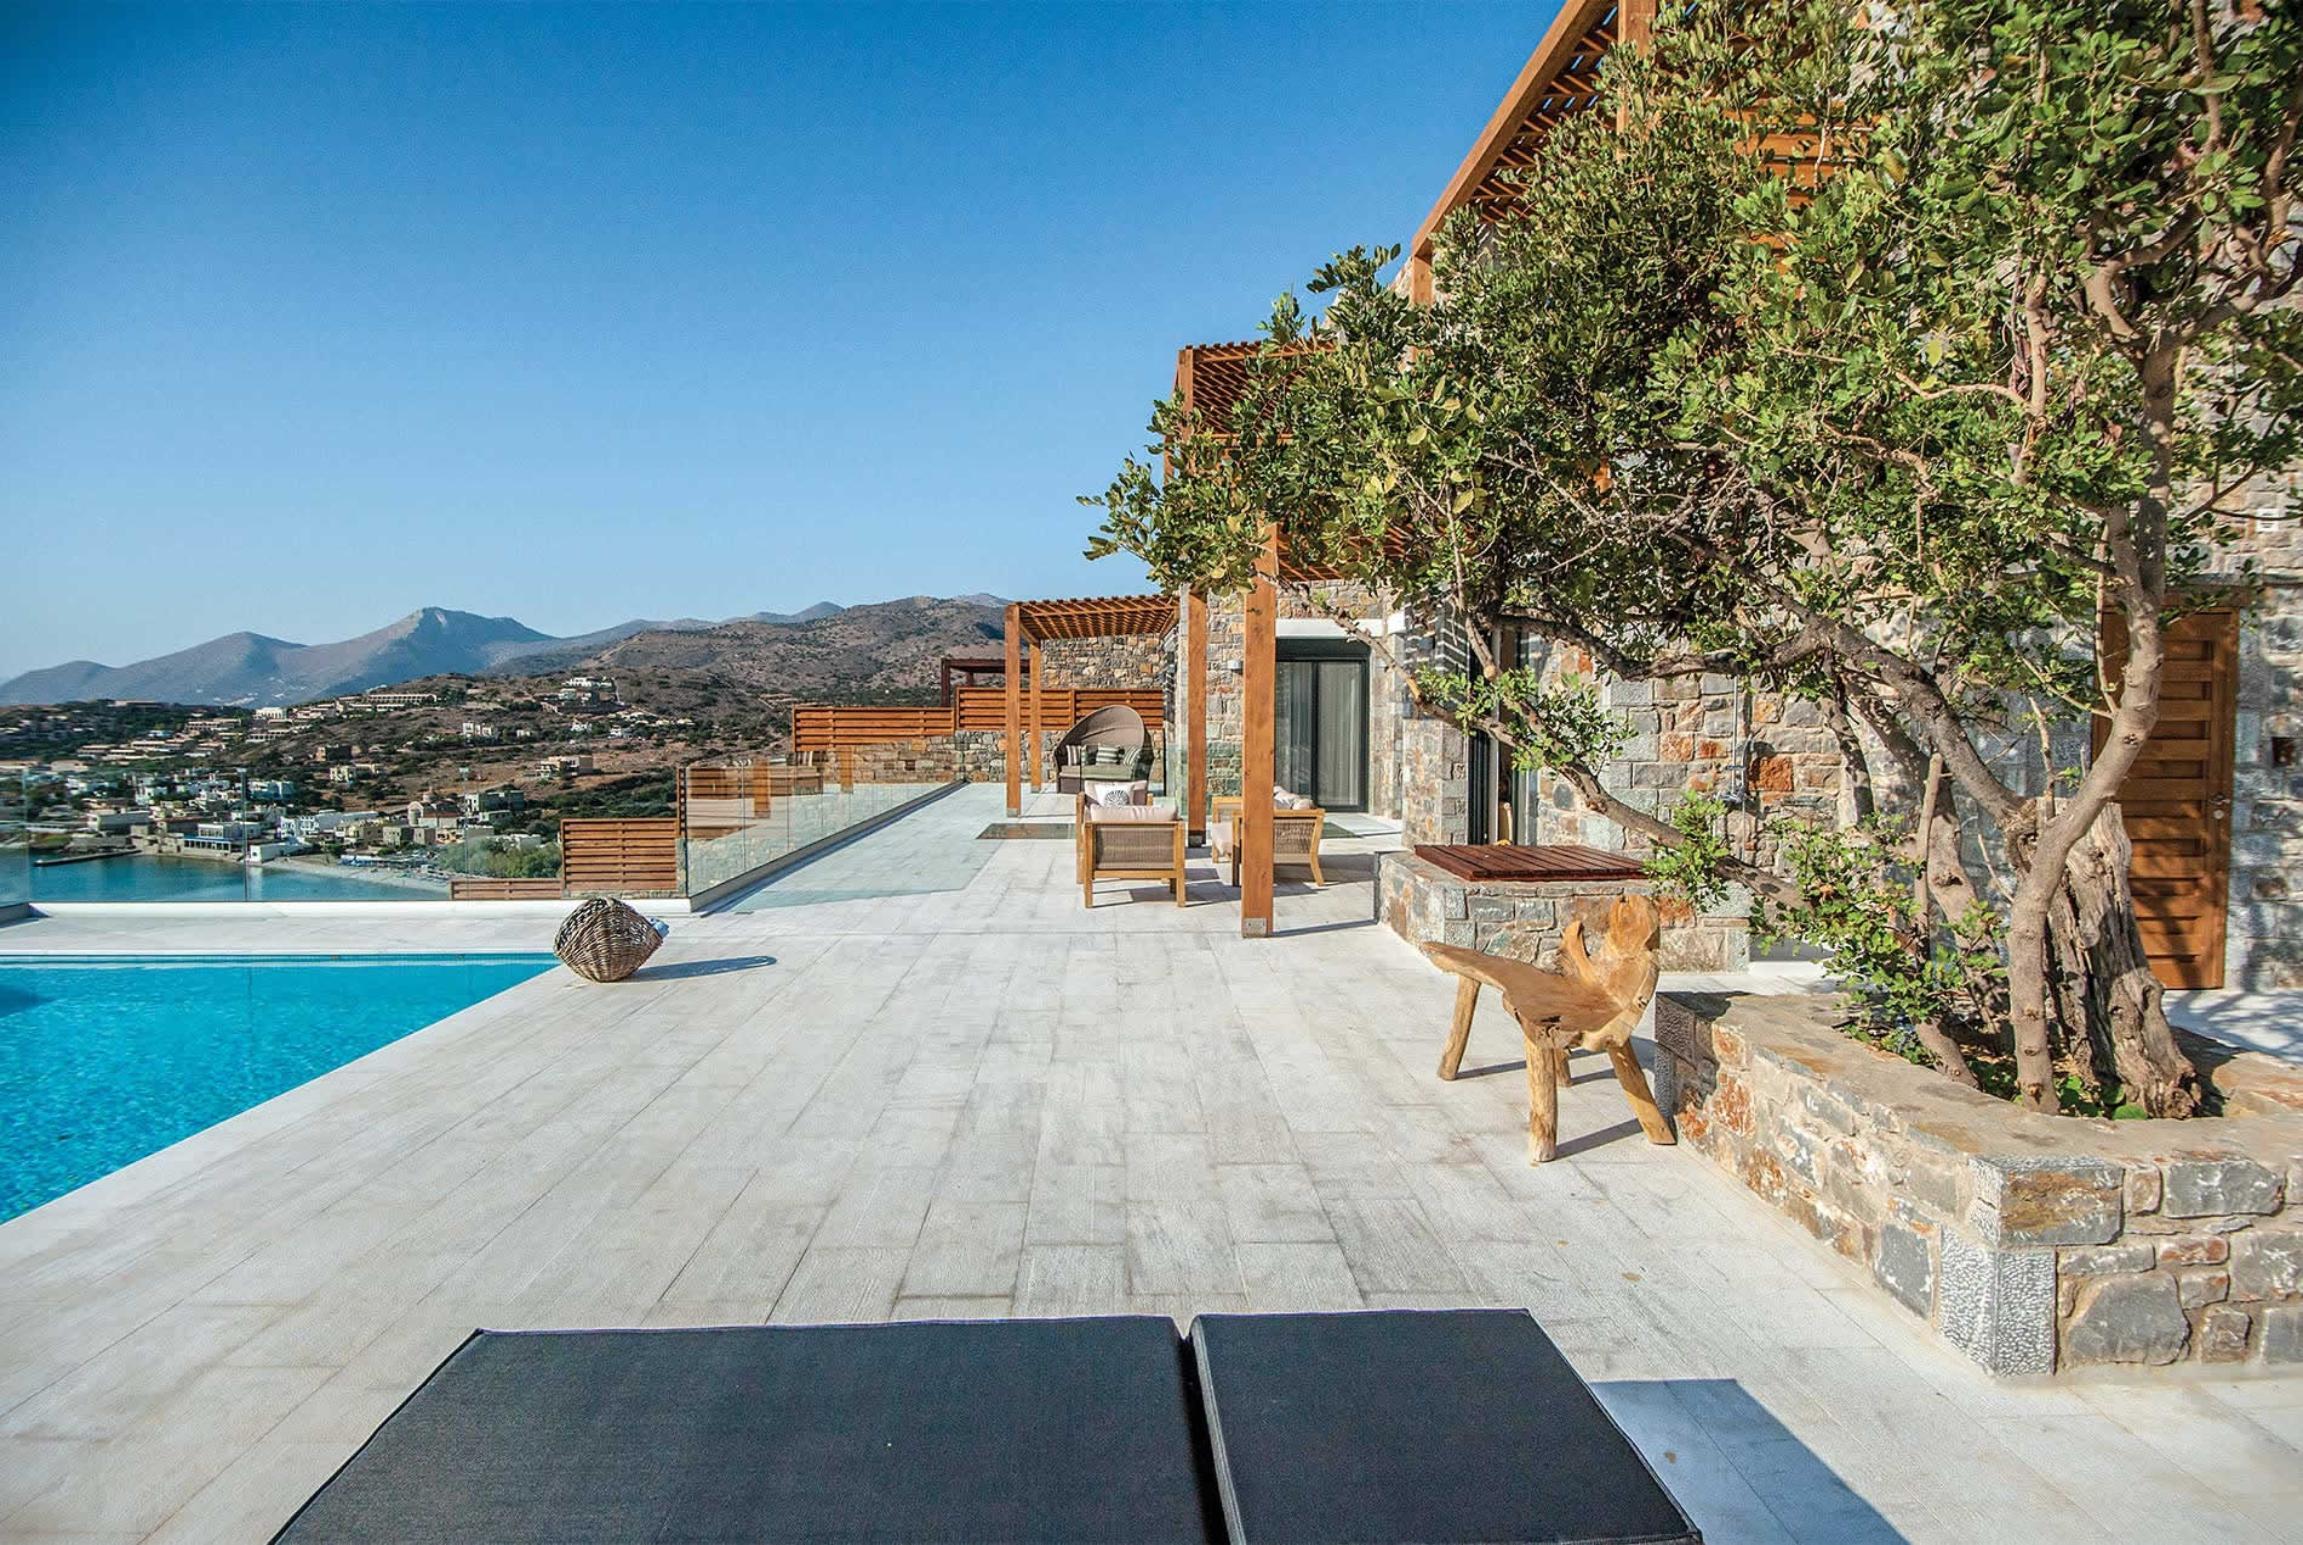 Ferienhaus Gina (2654193), Plaka, Kreta Nordküste, Kreta, Griechenland, Bild 25